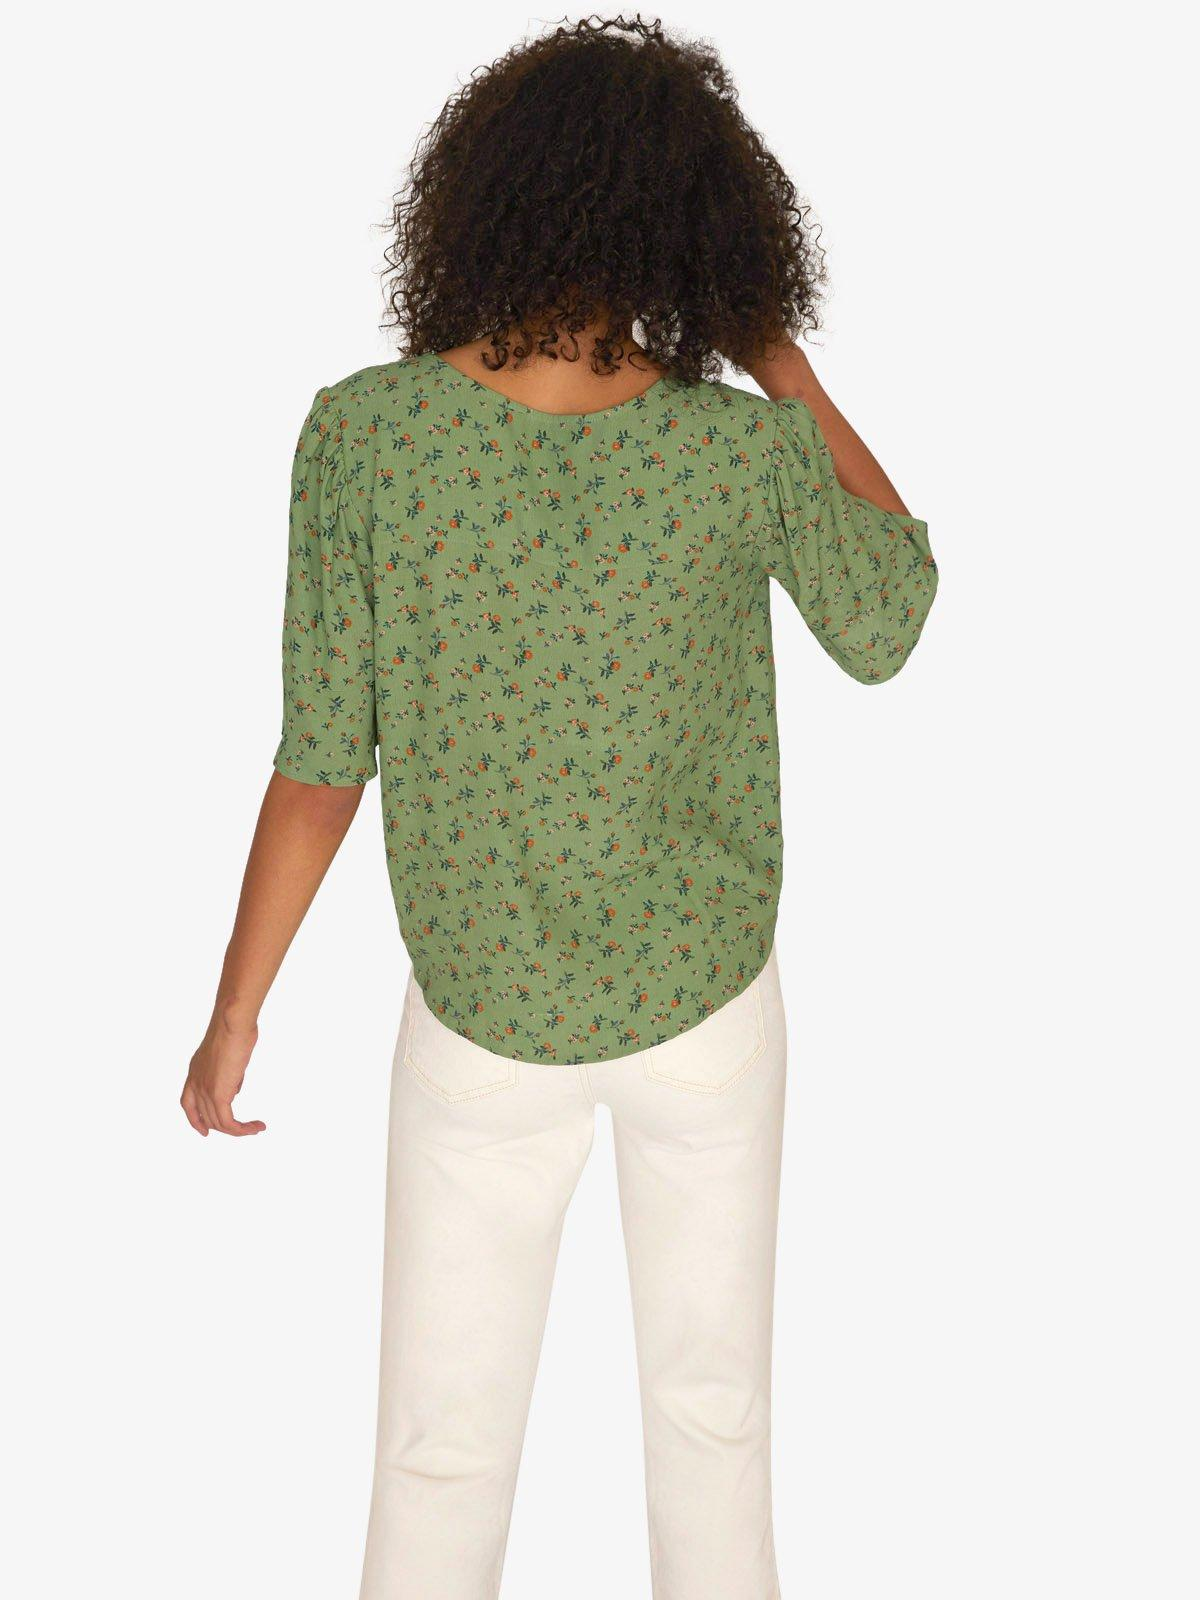 fba4e245aa383b Sanctuary Clothing Garden Party Wrap Top Go Green in Green - Lyst